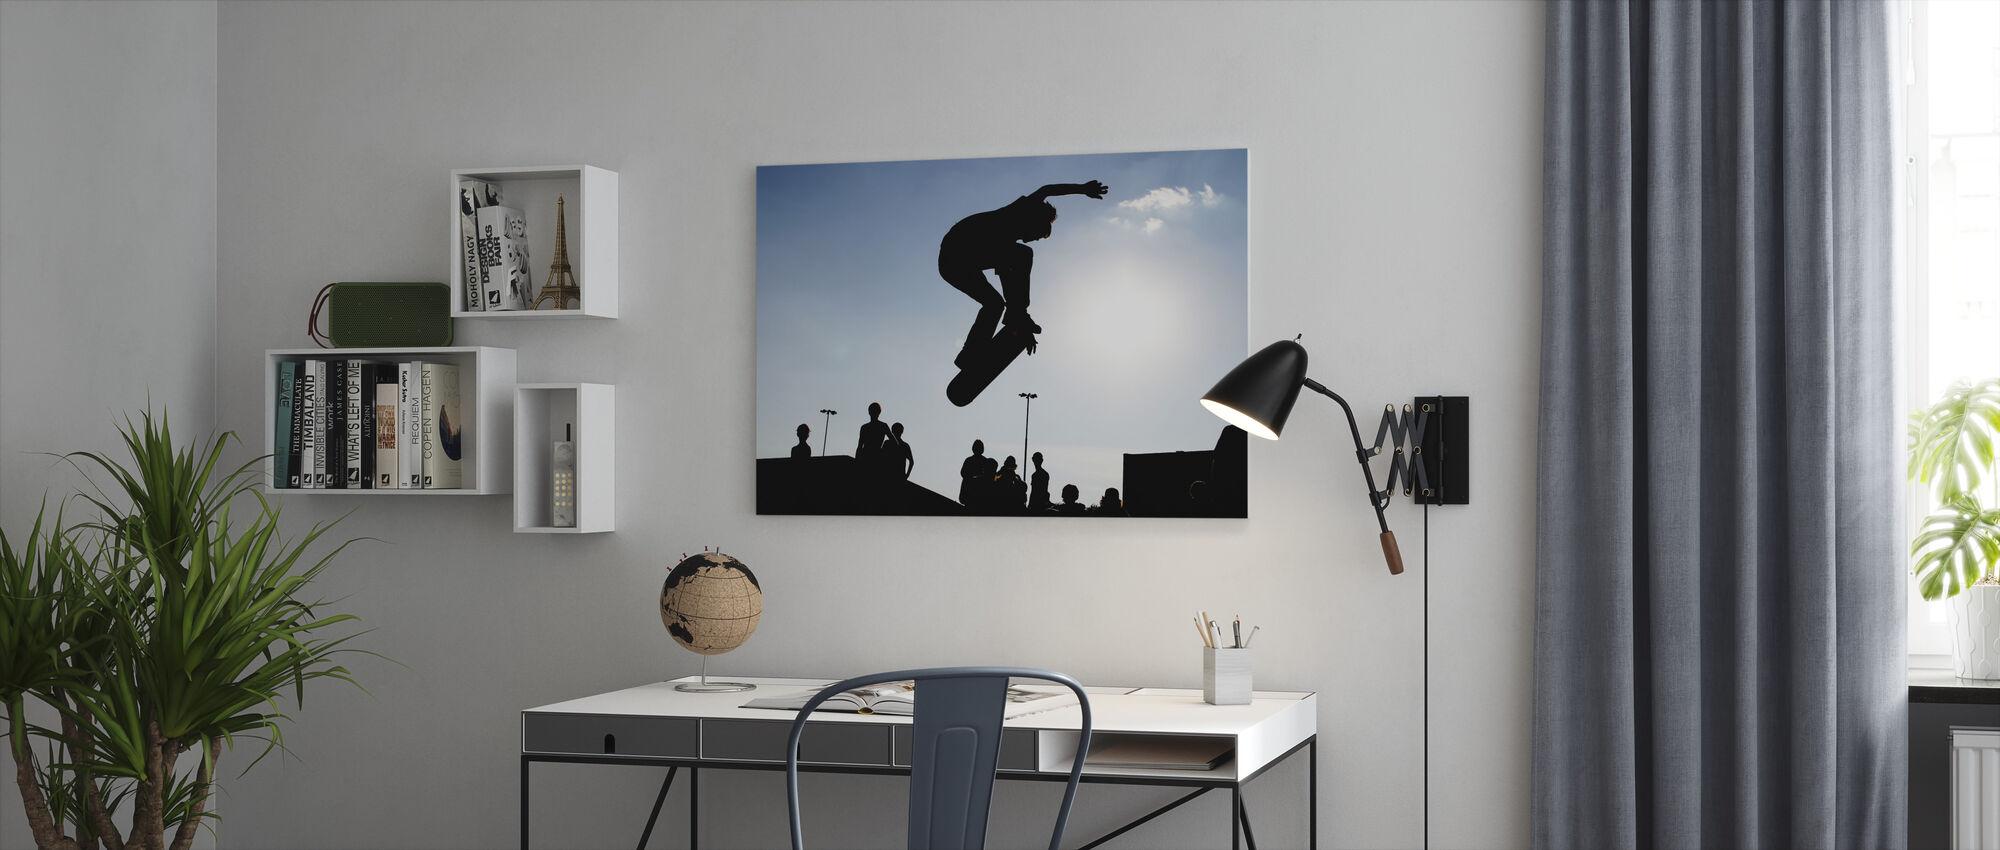 Skateboard Jump - Canvas print - Office